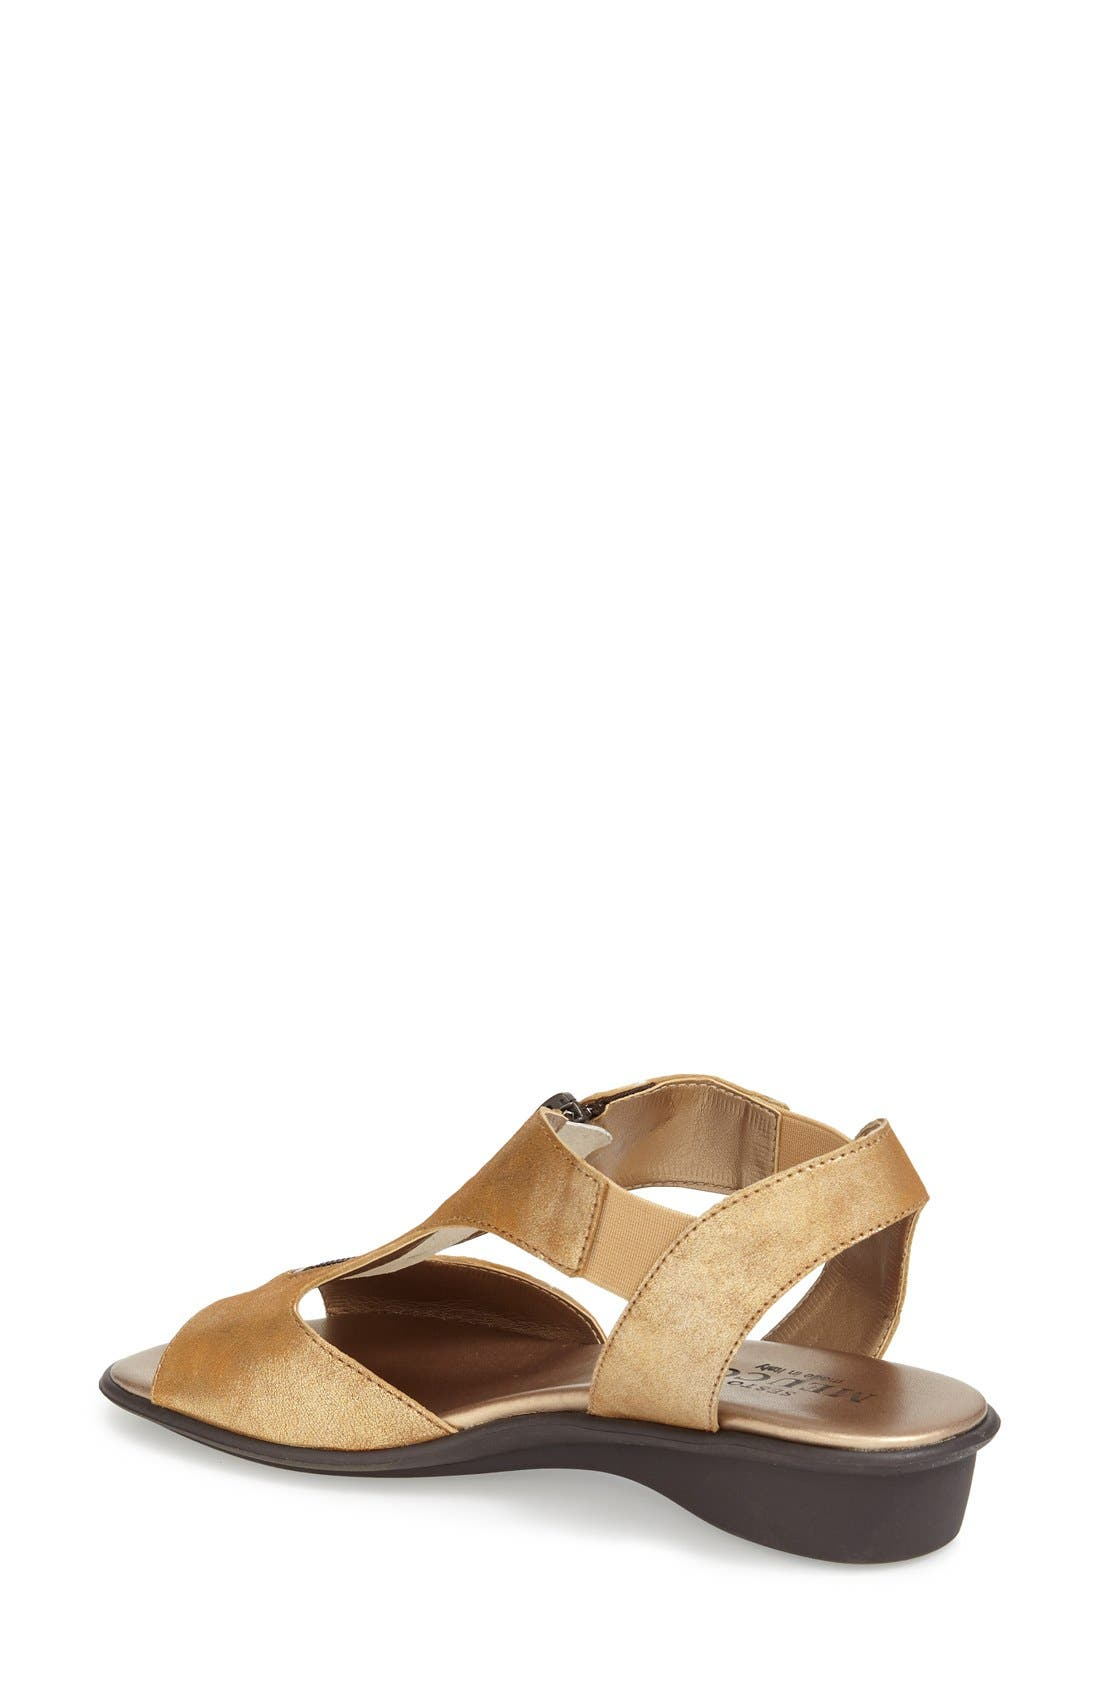 Alternate Image 2  - Sesto Meucci 'Euclid' Sandal (Women)